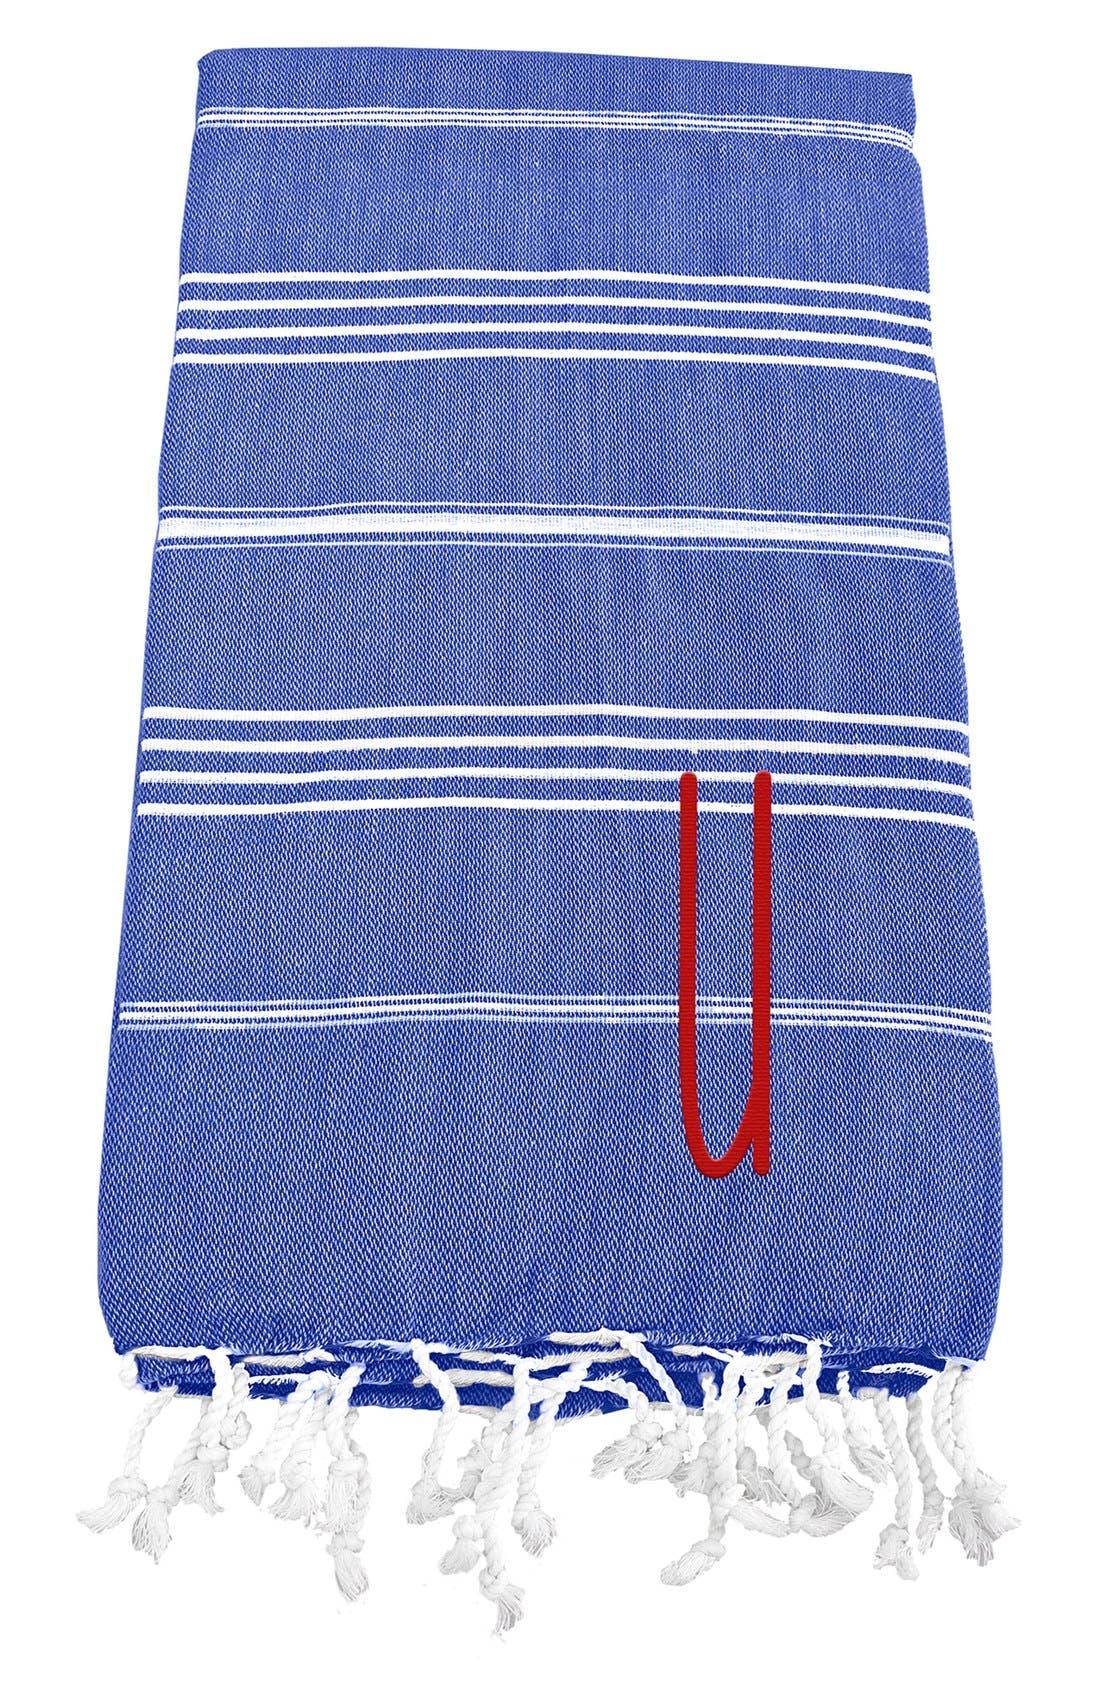 Monogram Turkish Cotton Towel,                             Main thumbnail 77, color,